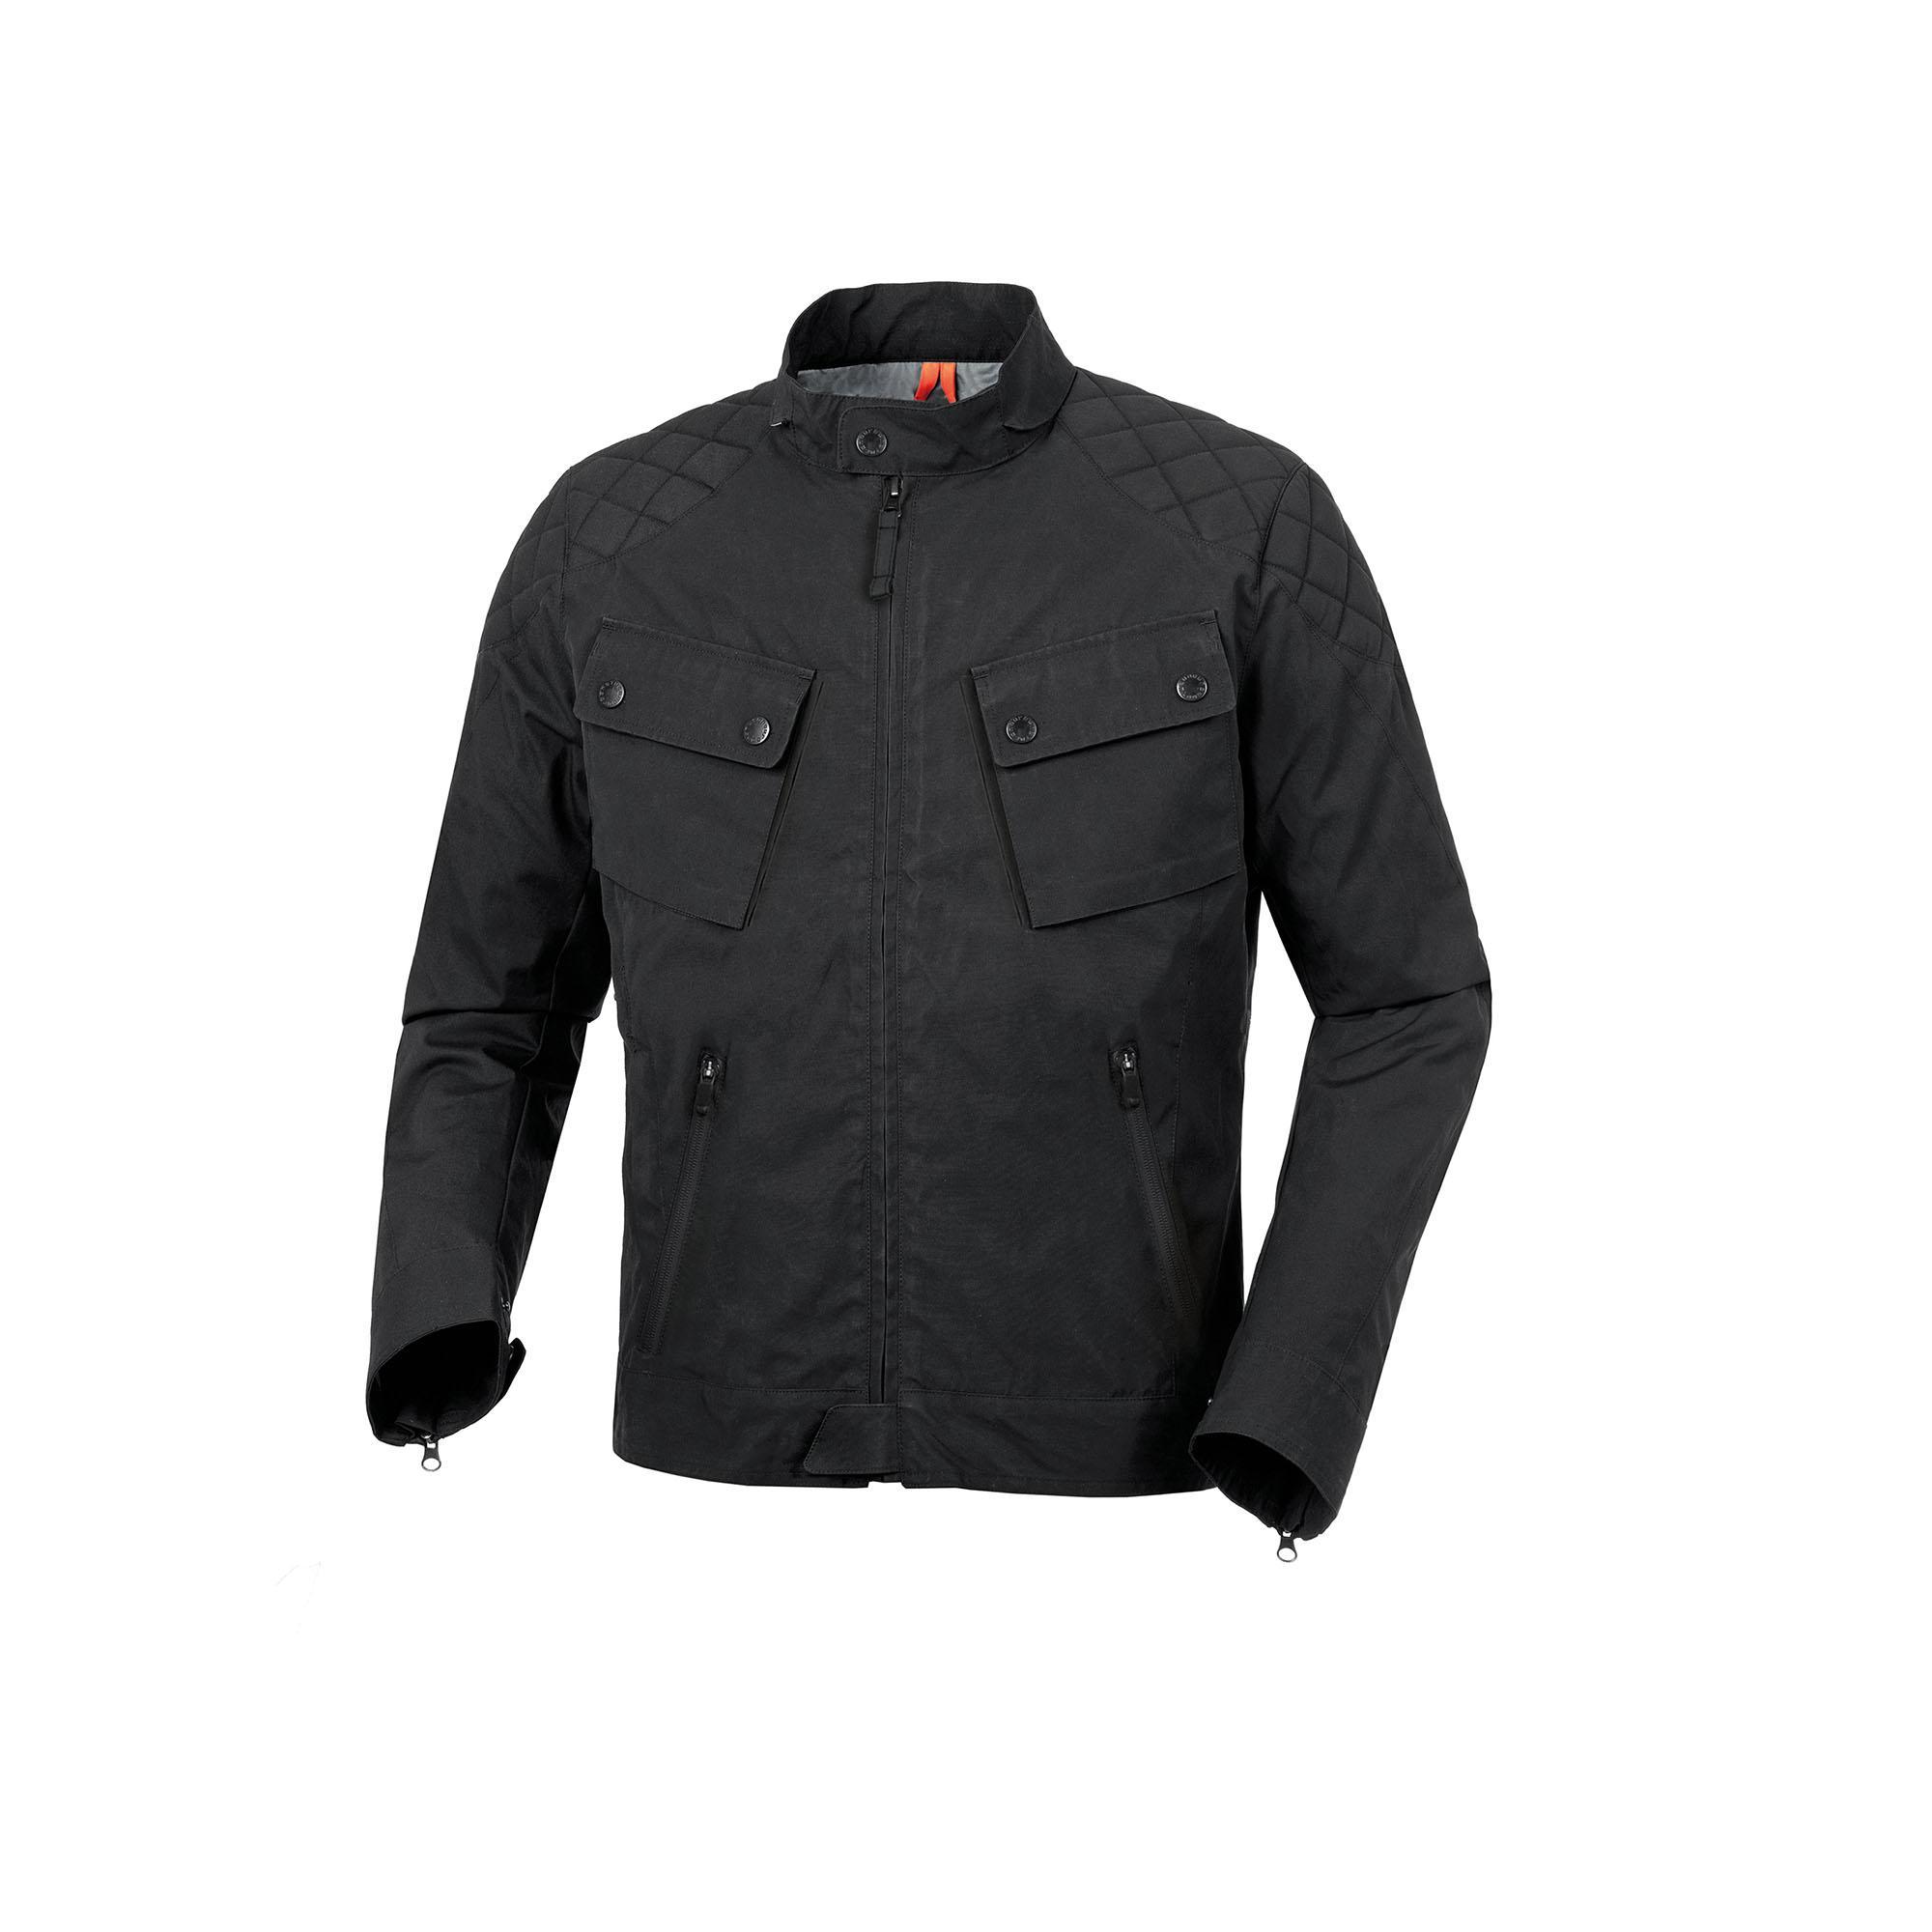 Jacket Pol 2g Black